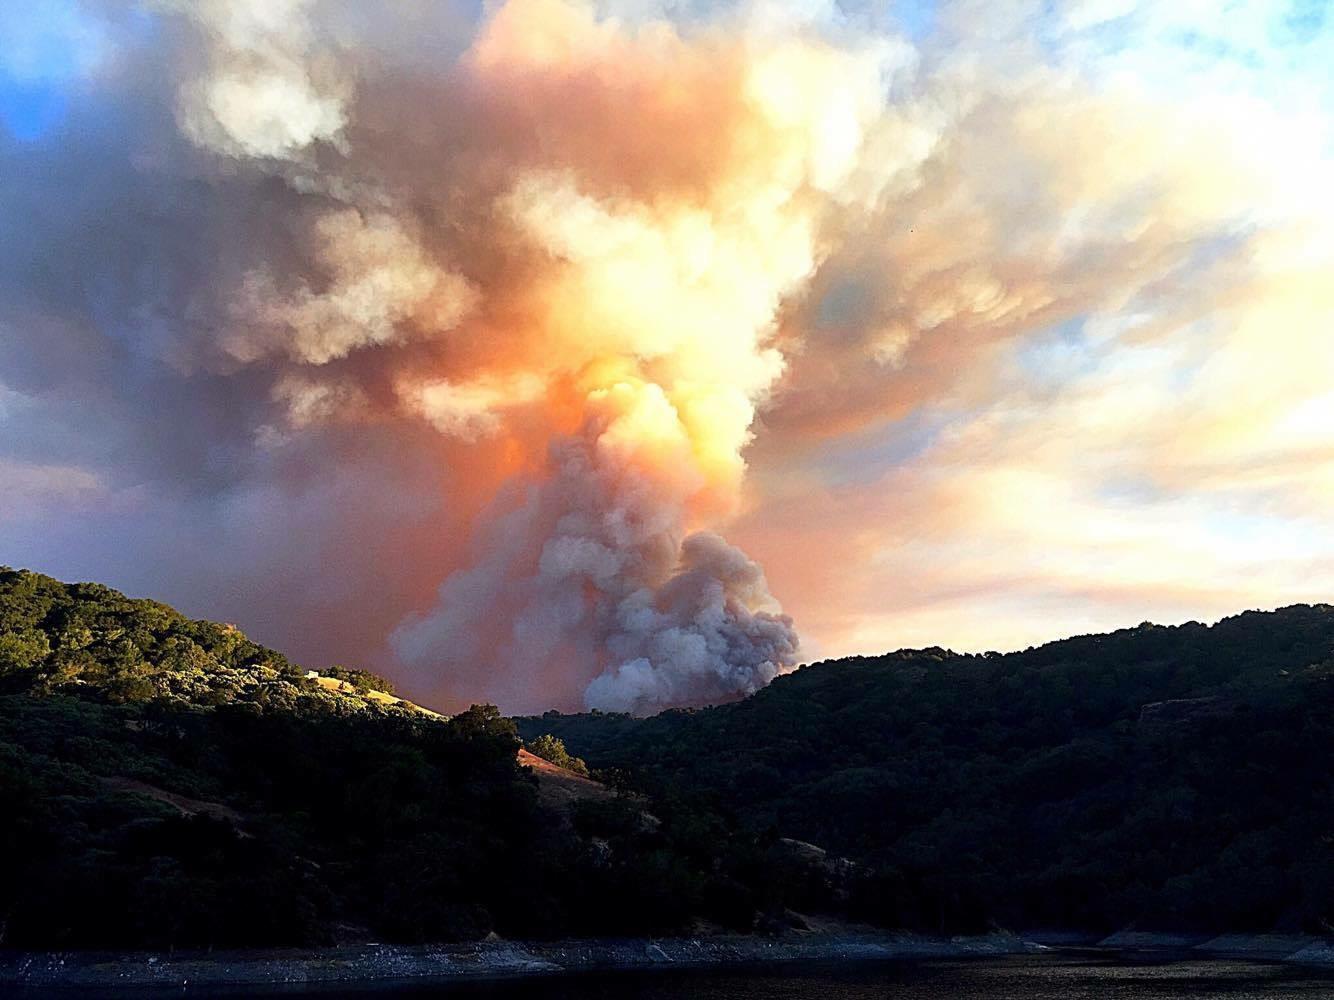 Loma Fire, San Jose, CA 2016. Photo by Bruno Rodriguez